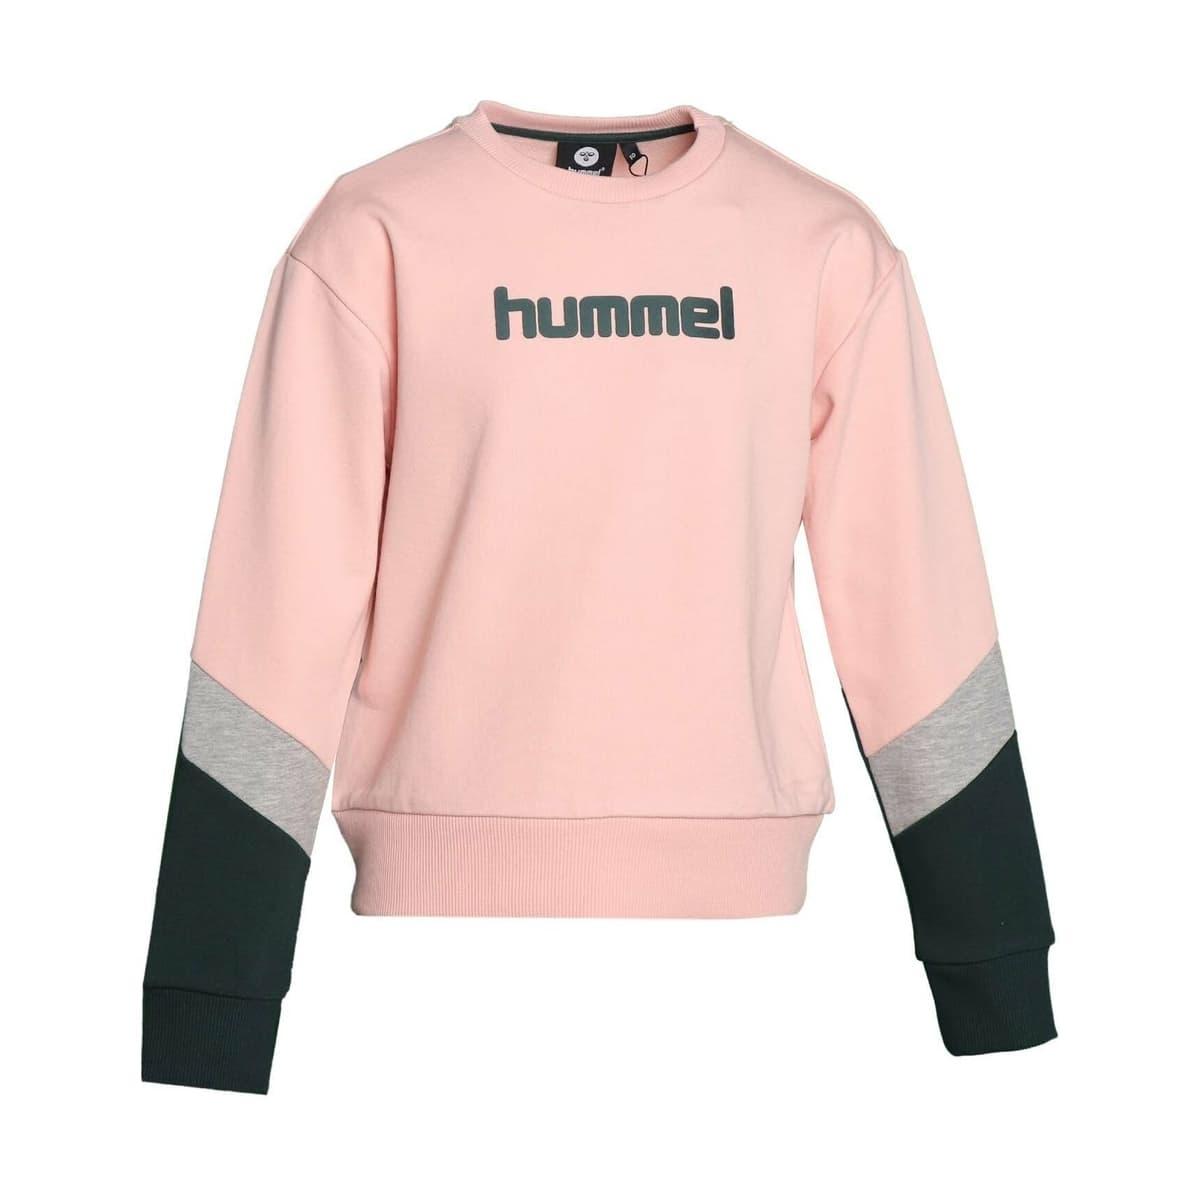 Hummel Halley Çocuk Pembe Sweatshirt (921251-3026)